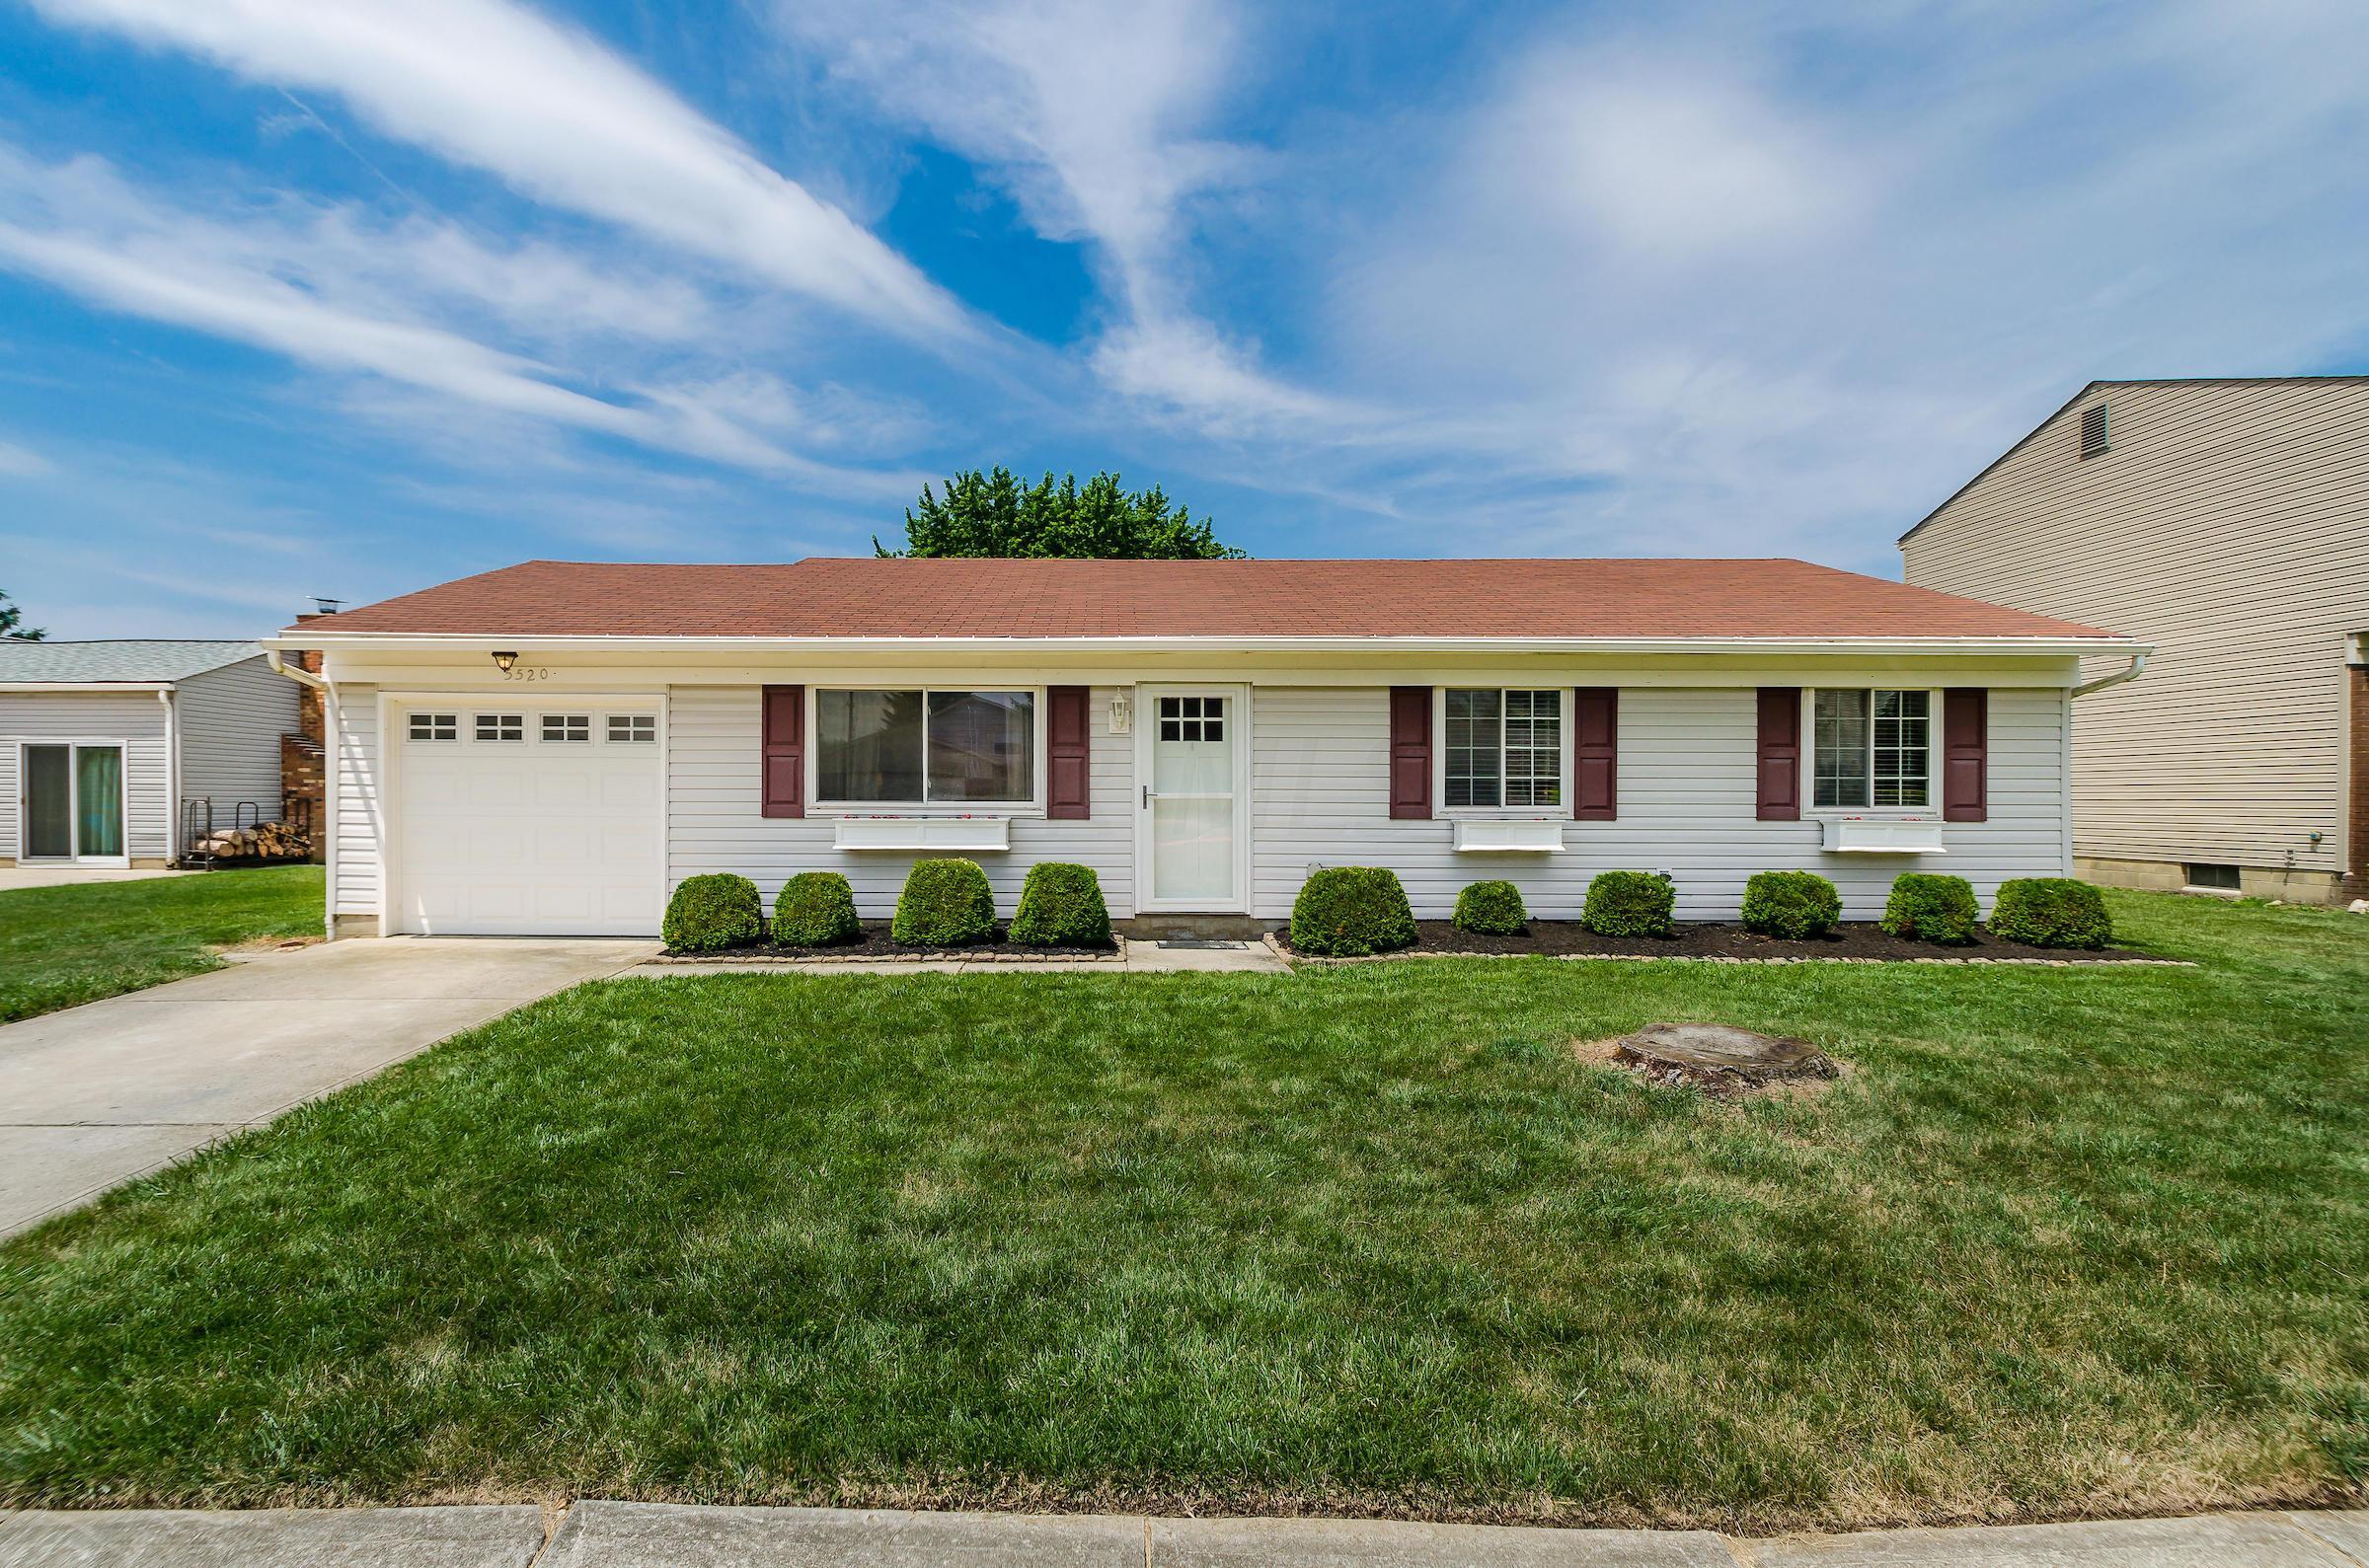 5520 Bluegrass Way, Hilliard, Ohio 43026, 3 Bedrooms Bedrooms, ,1 BathroomBathrooms,Residential,For Sale,Bluegrass,220021061